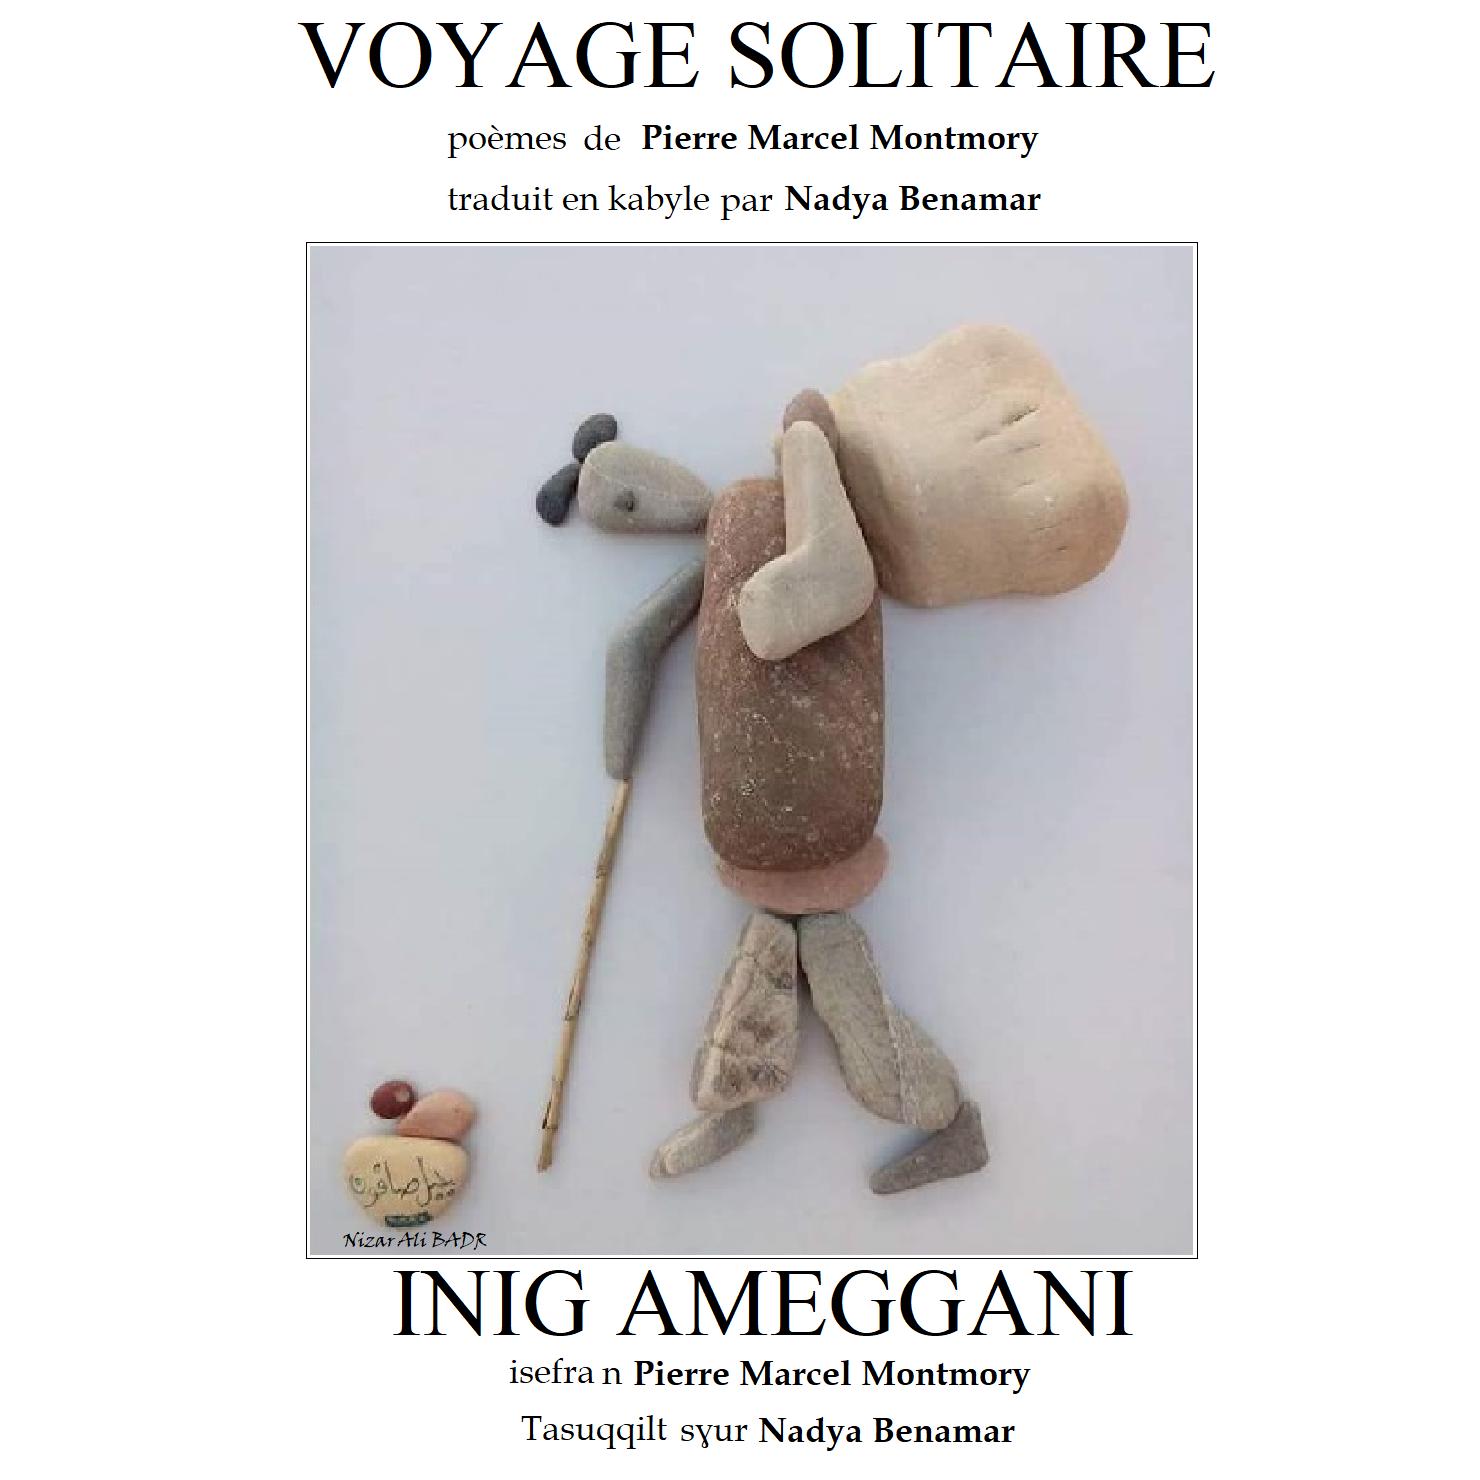 VOYAGE SOLITAIRE de Pierre Marcel Montmory traduit en kabyle par Nadya Benamar INIG AMEGGANI